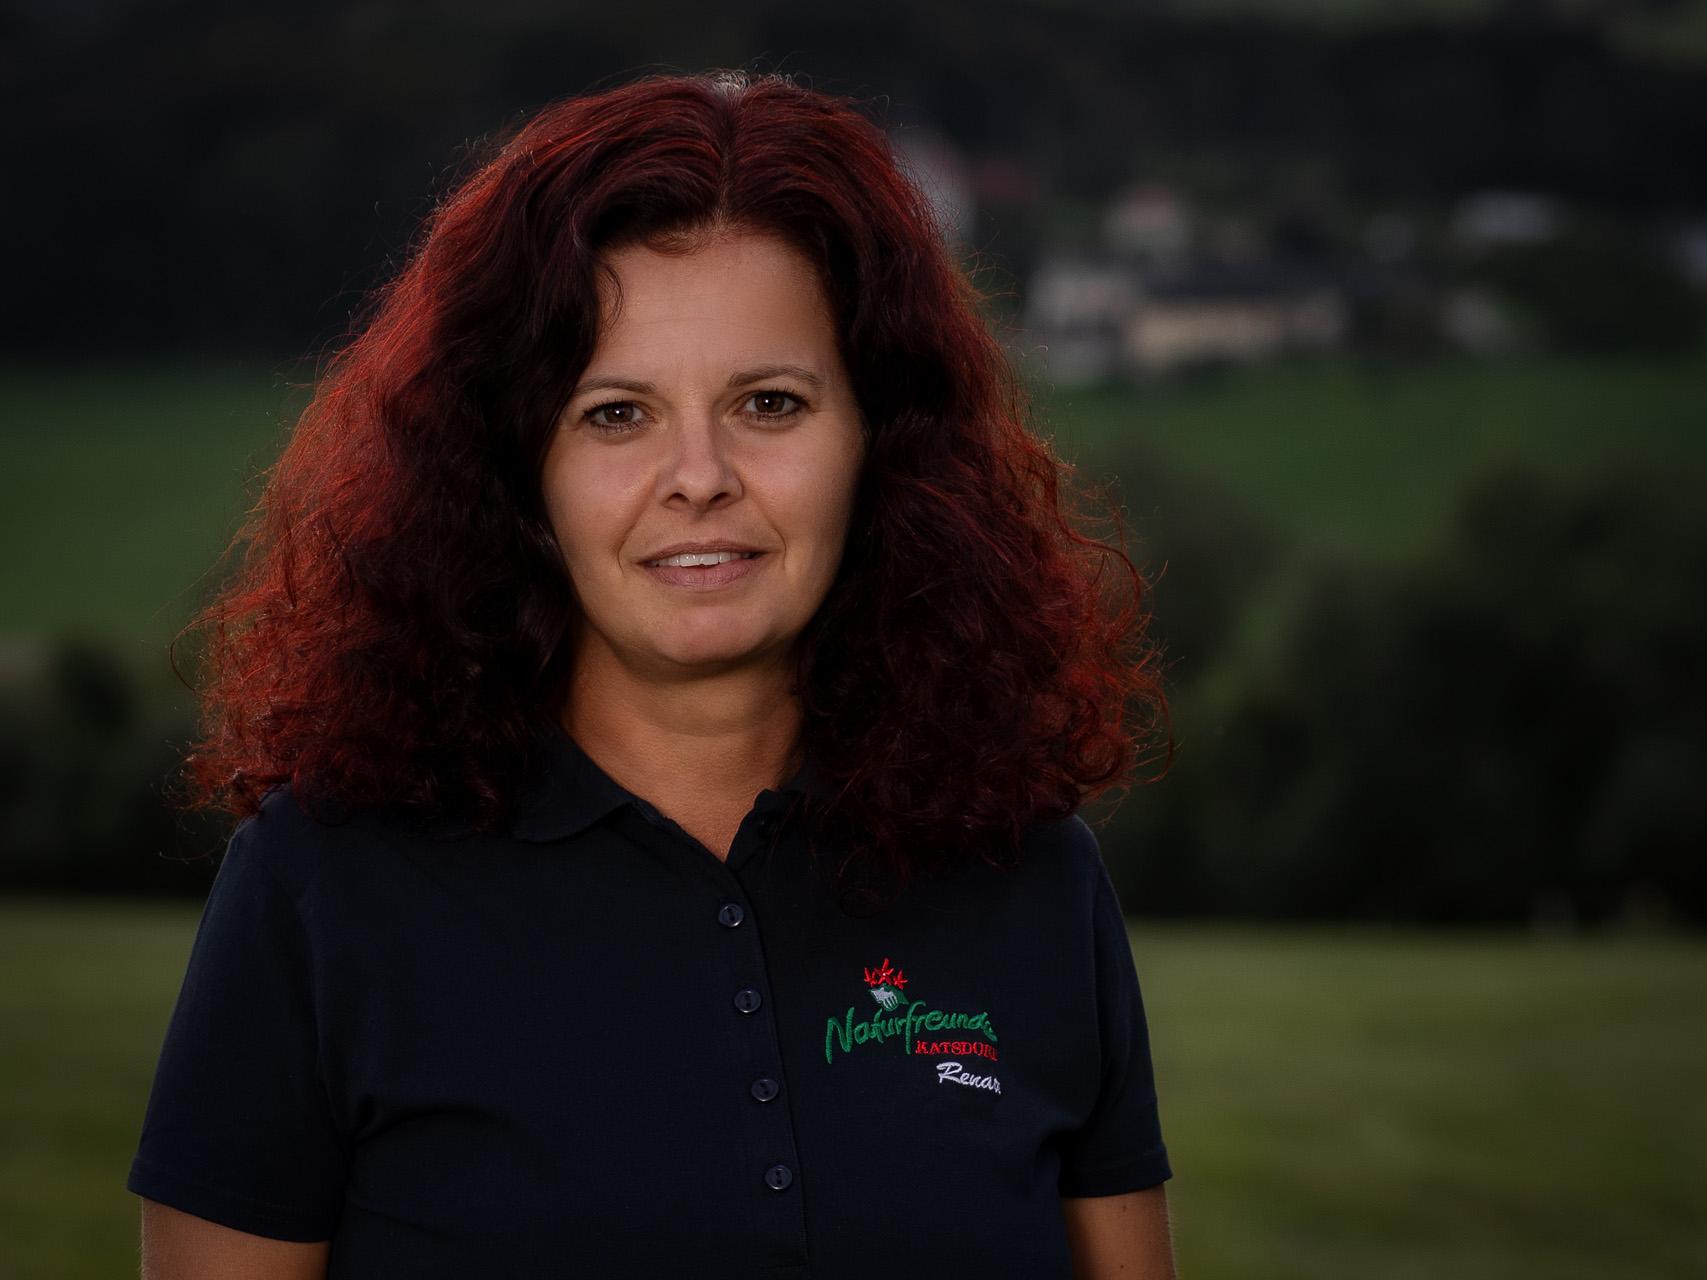 Renate Straußberger